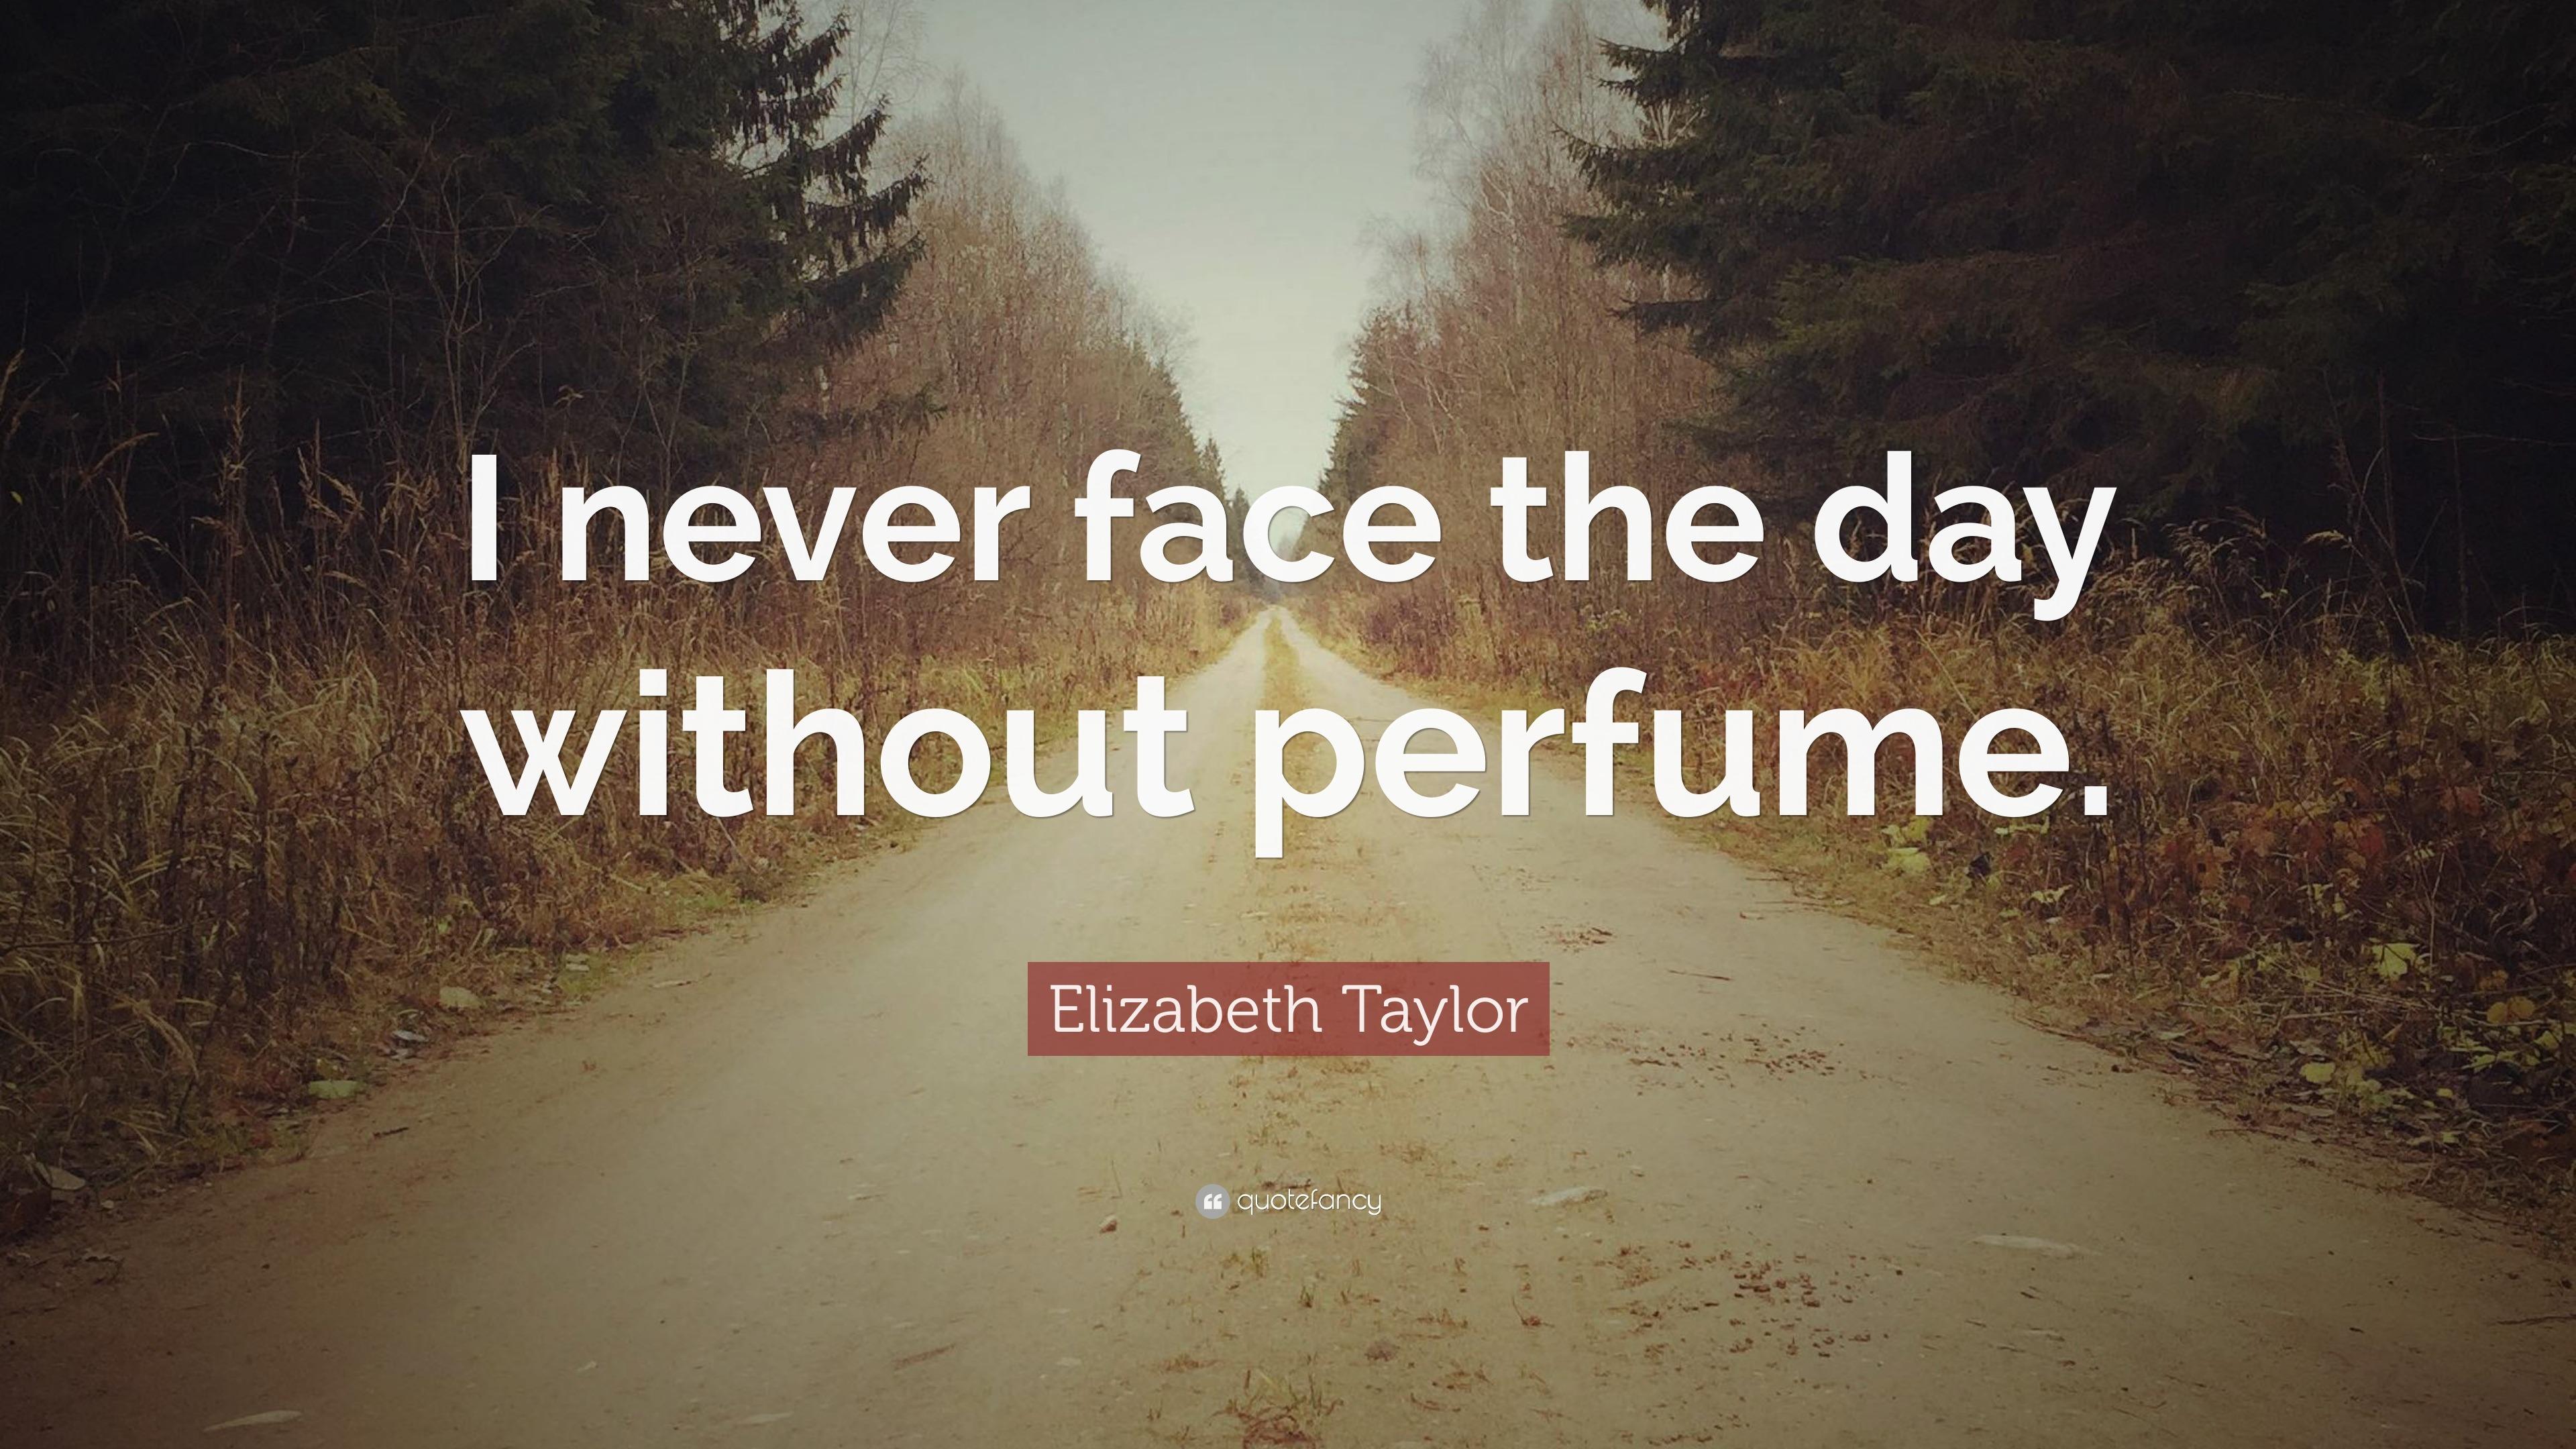 Elizabeth Taylor Quotes (100 wallpapers) - Quotefancy